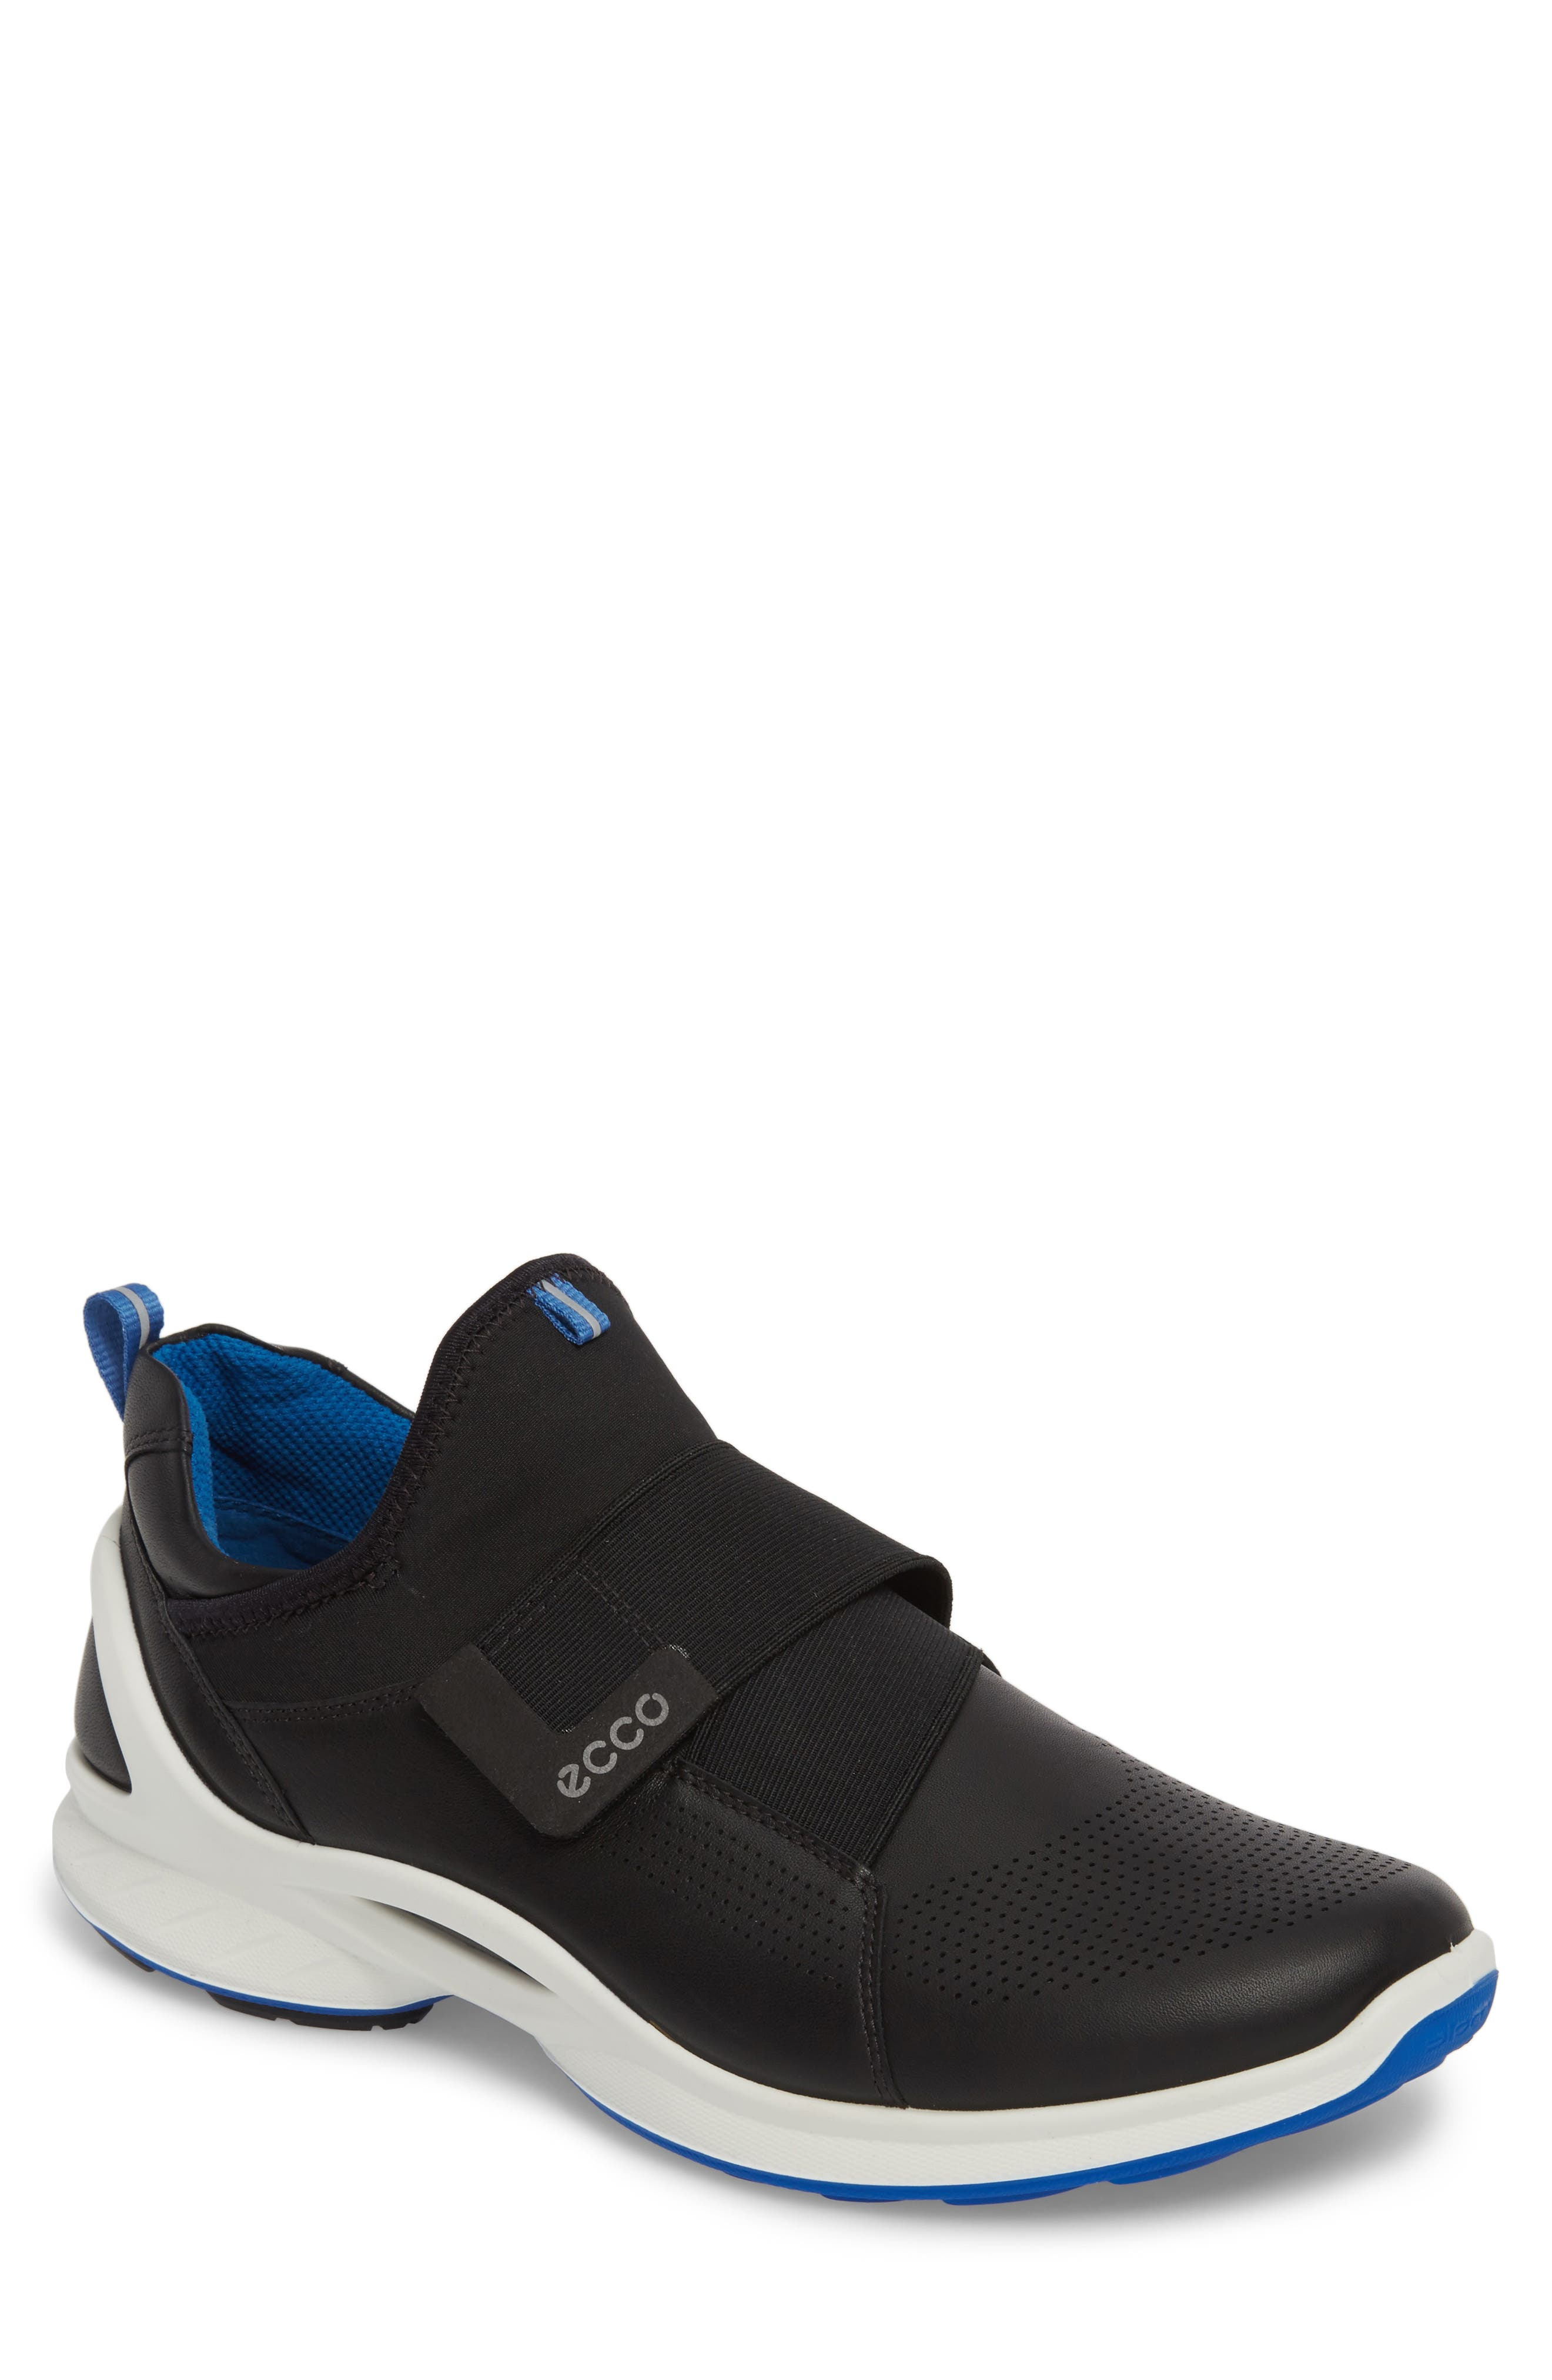 BIOM Fjuel Band Sneaker,                             Main thumbnail 1, color,                             009